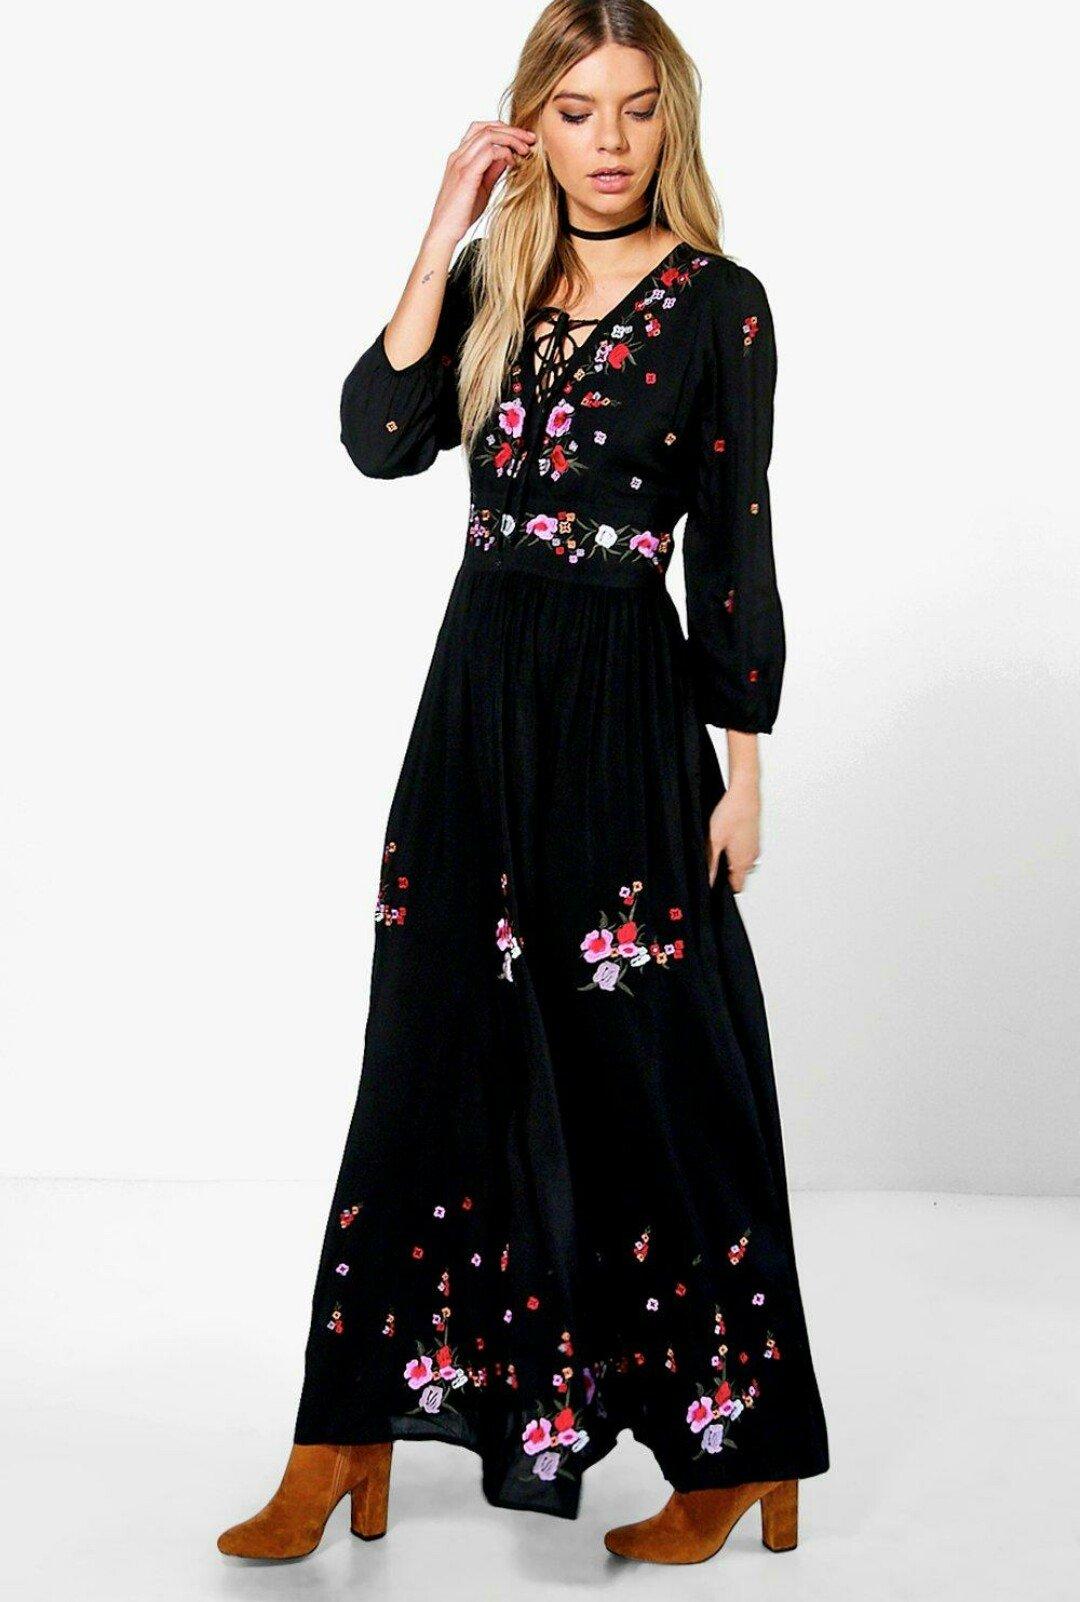 BooHoo | Spring Maxi Dresses - Style & Life by Susana